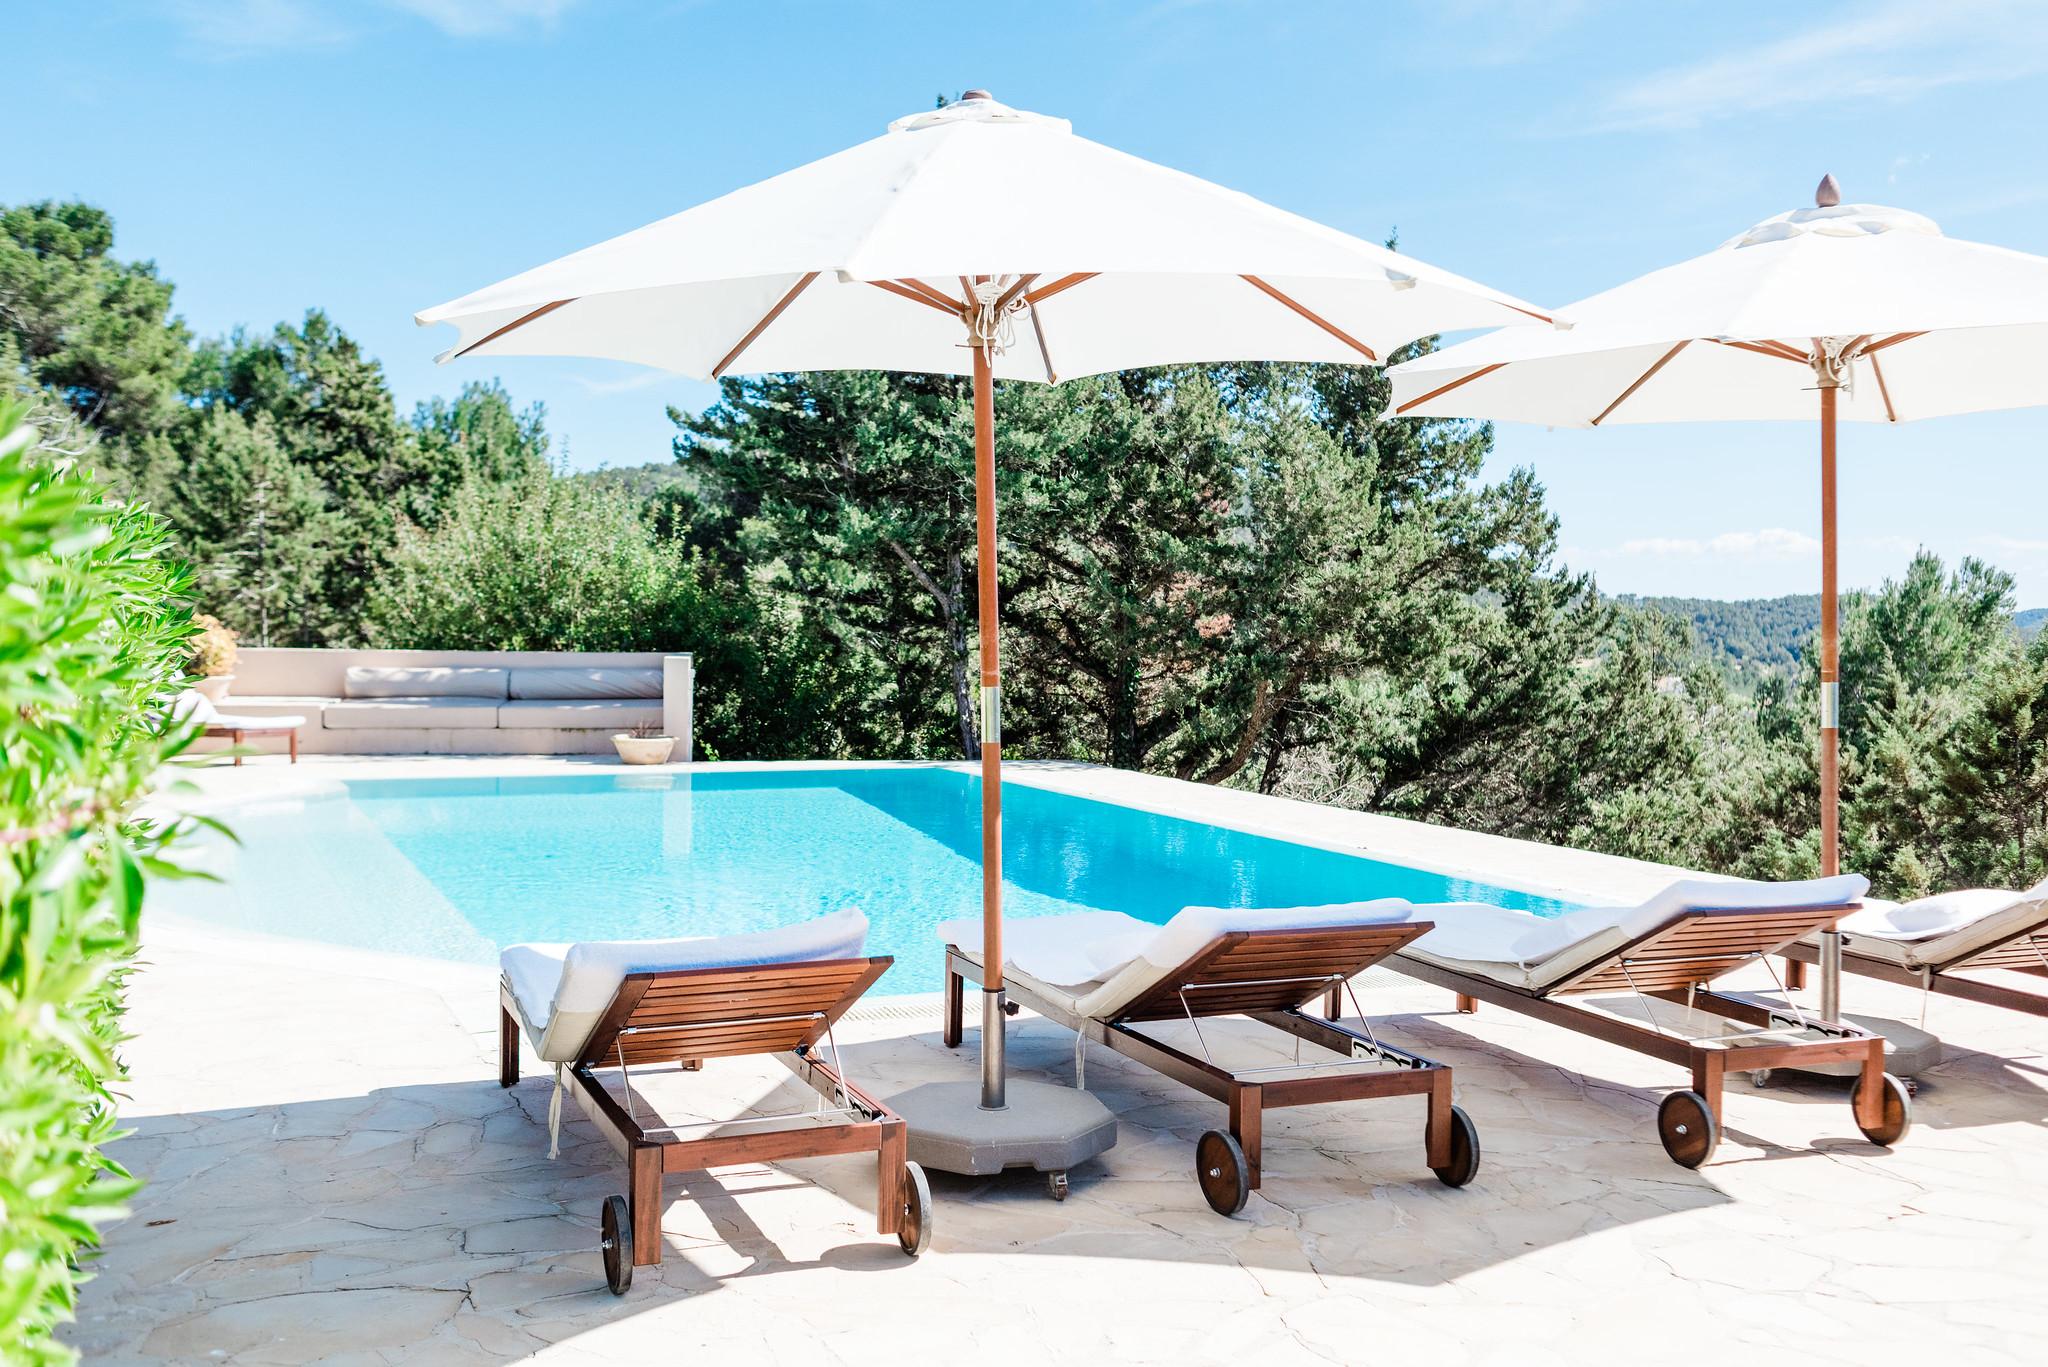 https://www.white-ibiza.com/wp-content/uploads/2020/06/white-ibiza-villas-villa-andrea-exterior-sunloungeres2.jpg